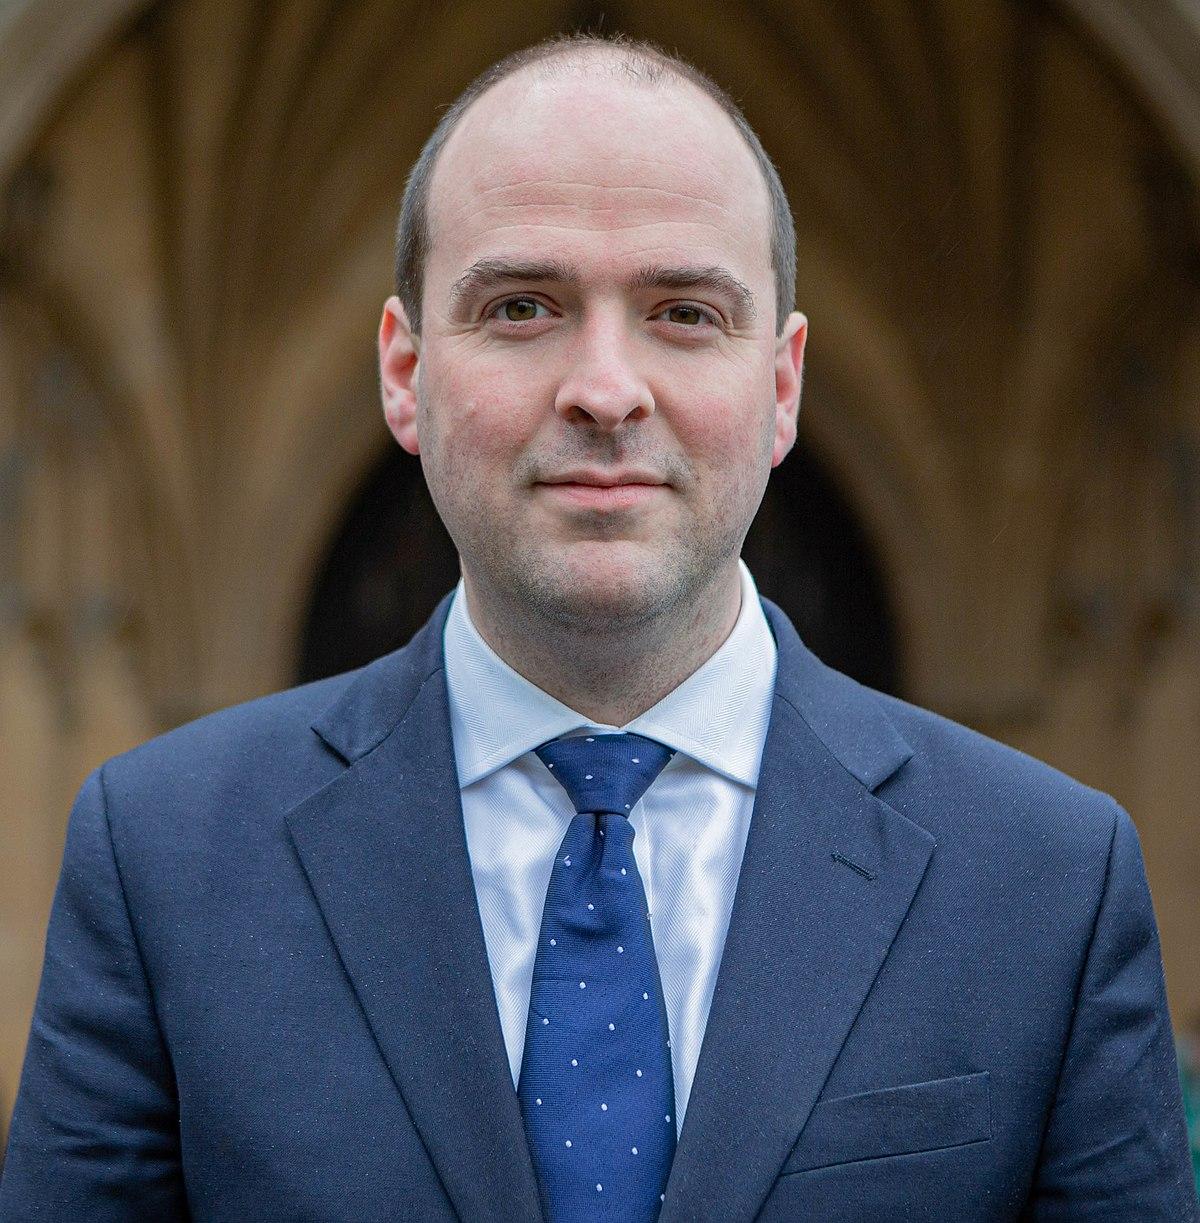 Richard Holden MP for North West Durham